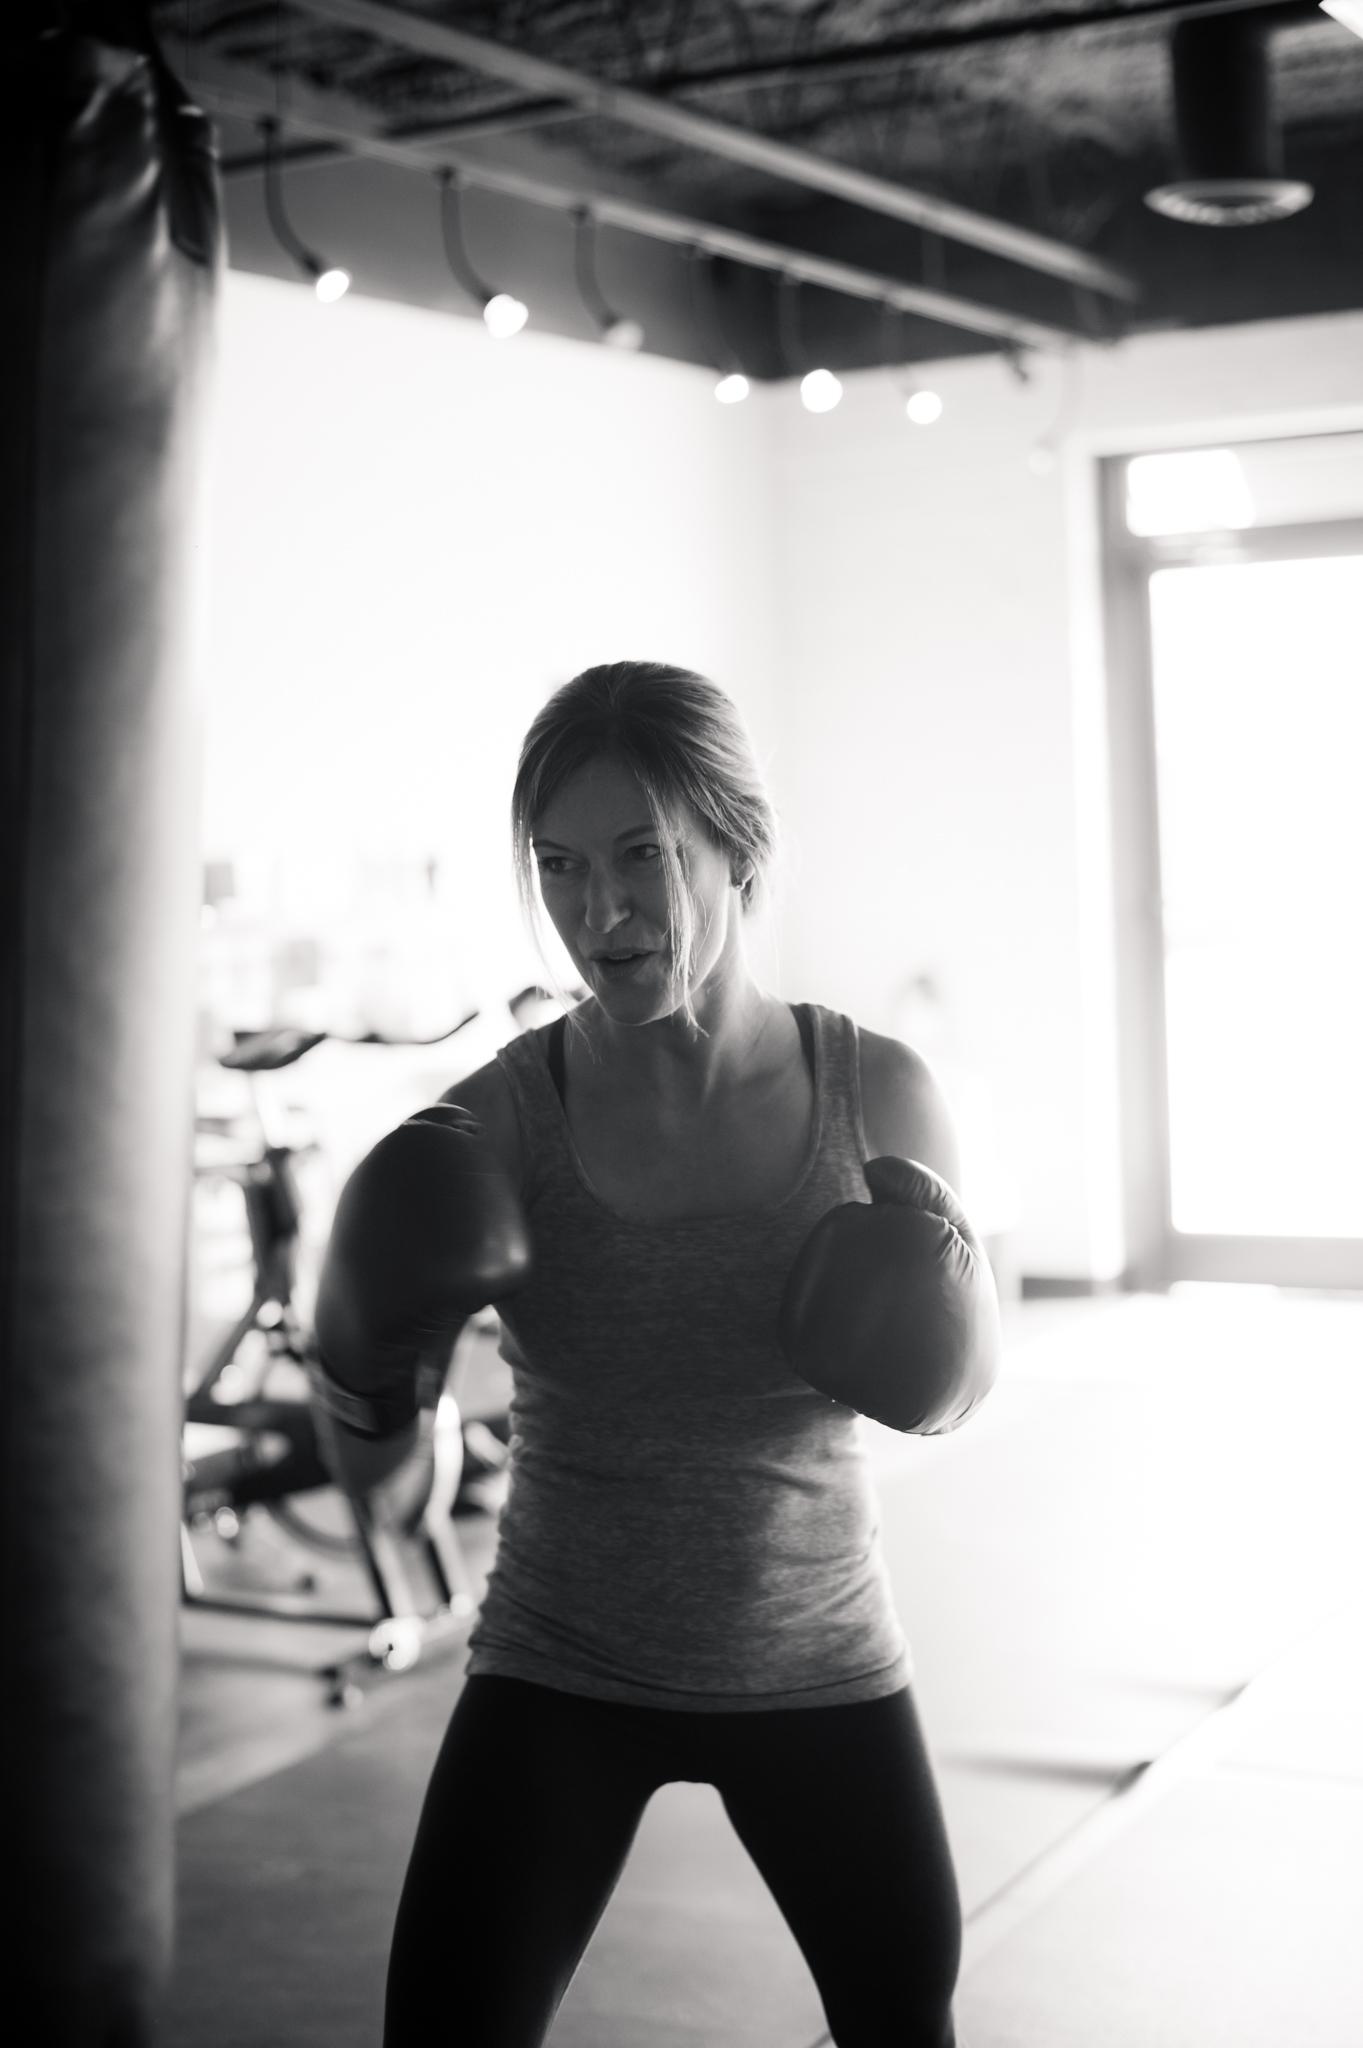 Lori Teppara wears boxing gloves and boxes a punching bag at FIT HUB.